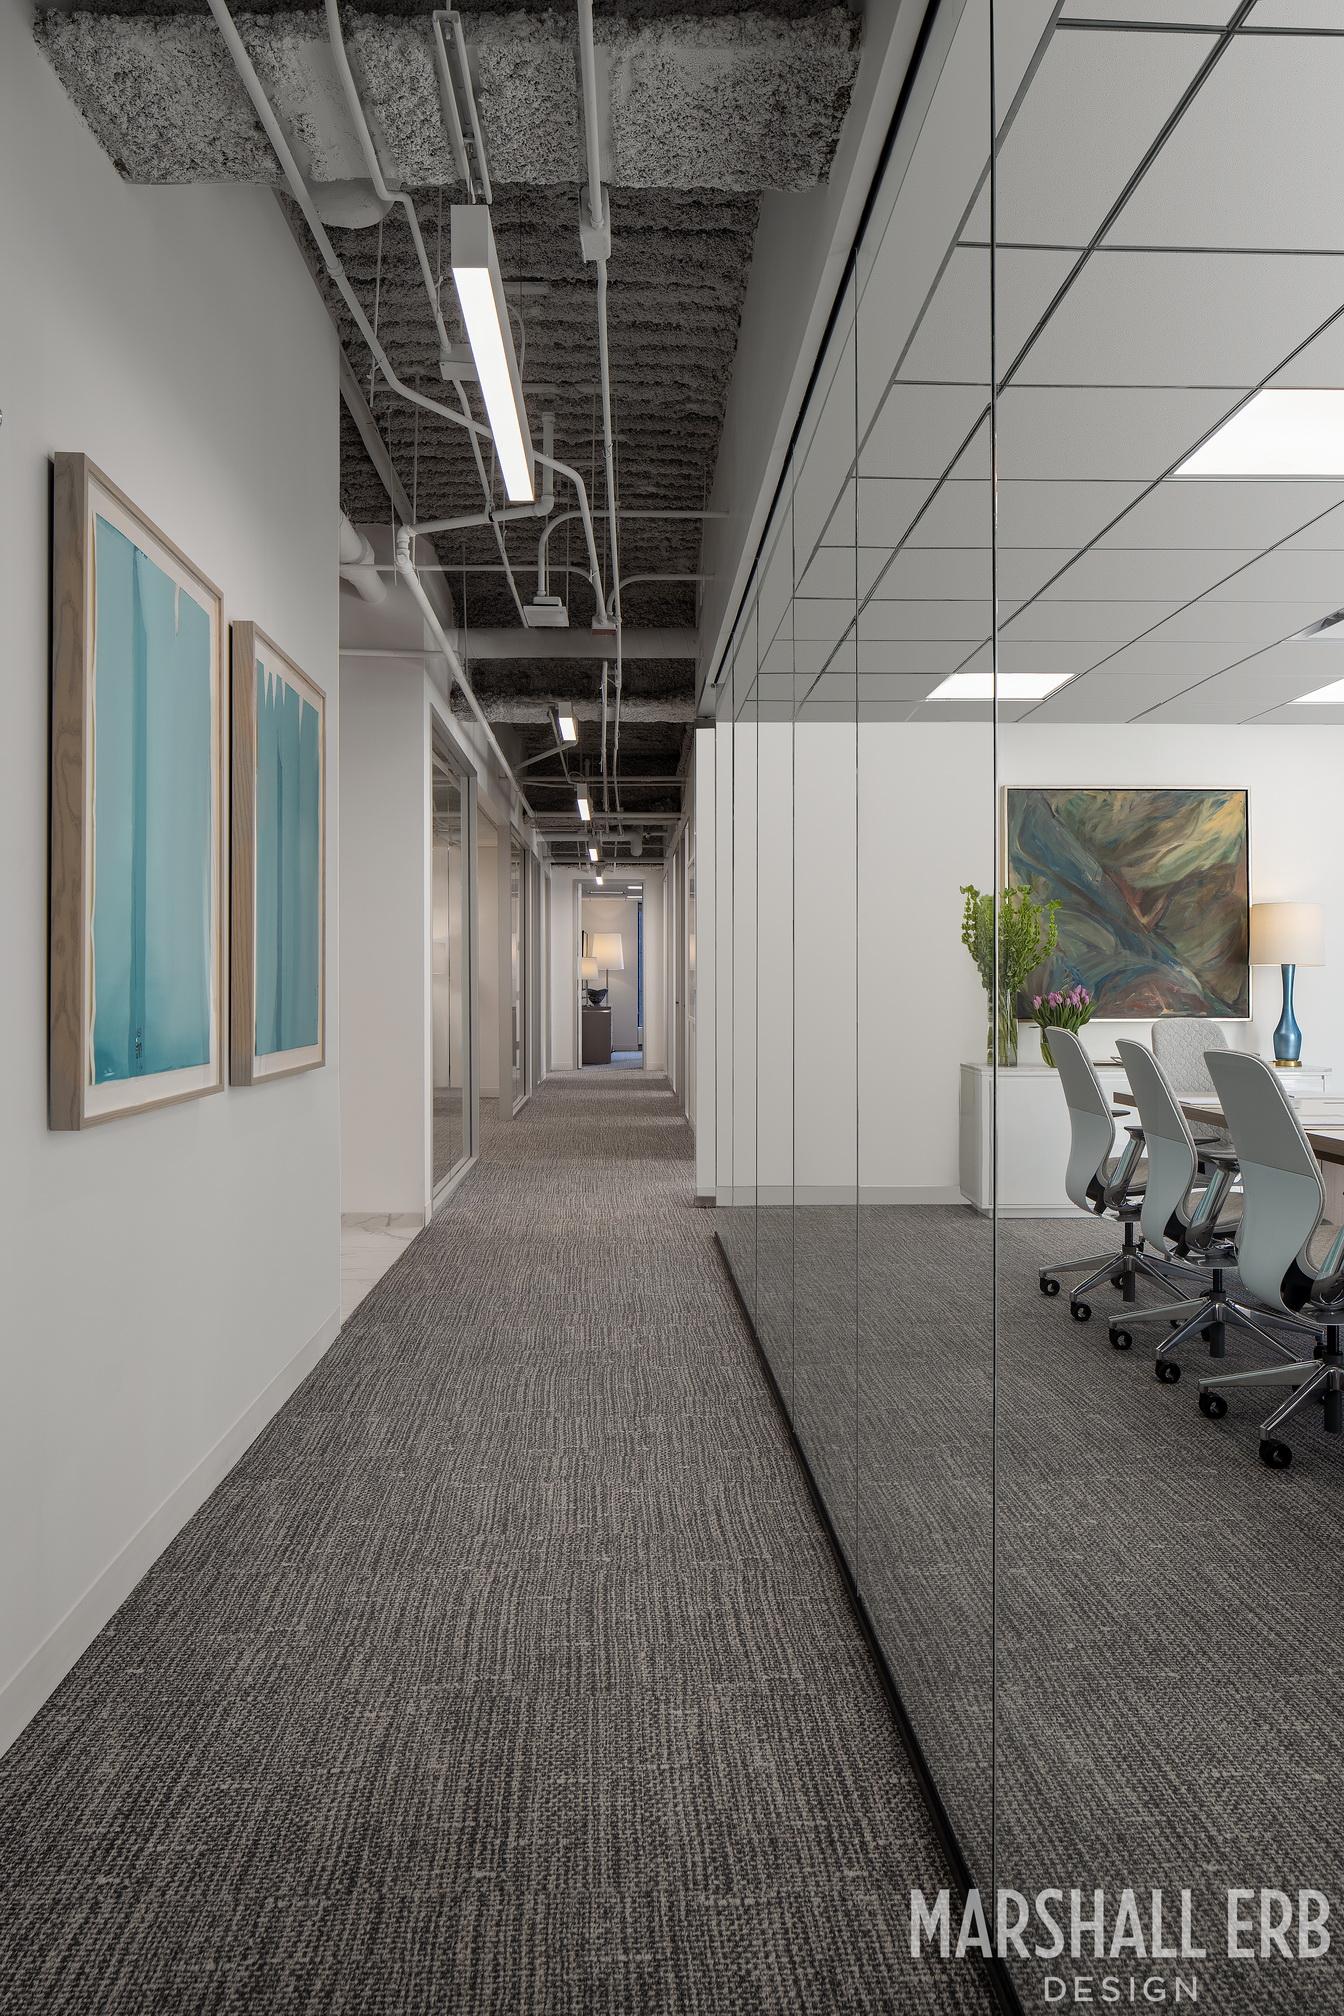 Marshall_Erb_Design_Sweeney_Scharkey_Blanchard_ASID_Award_Winning_Office_9